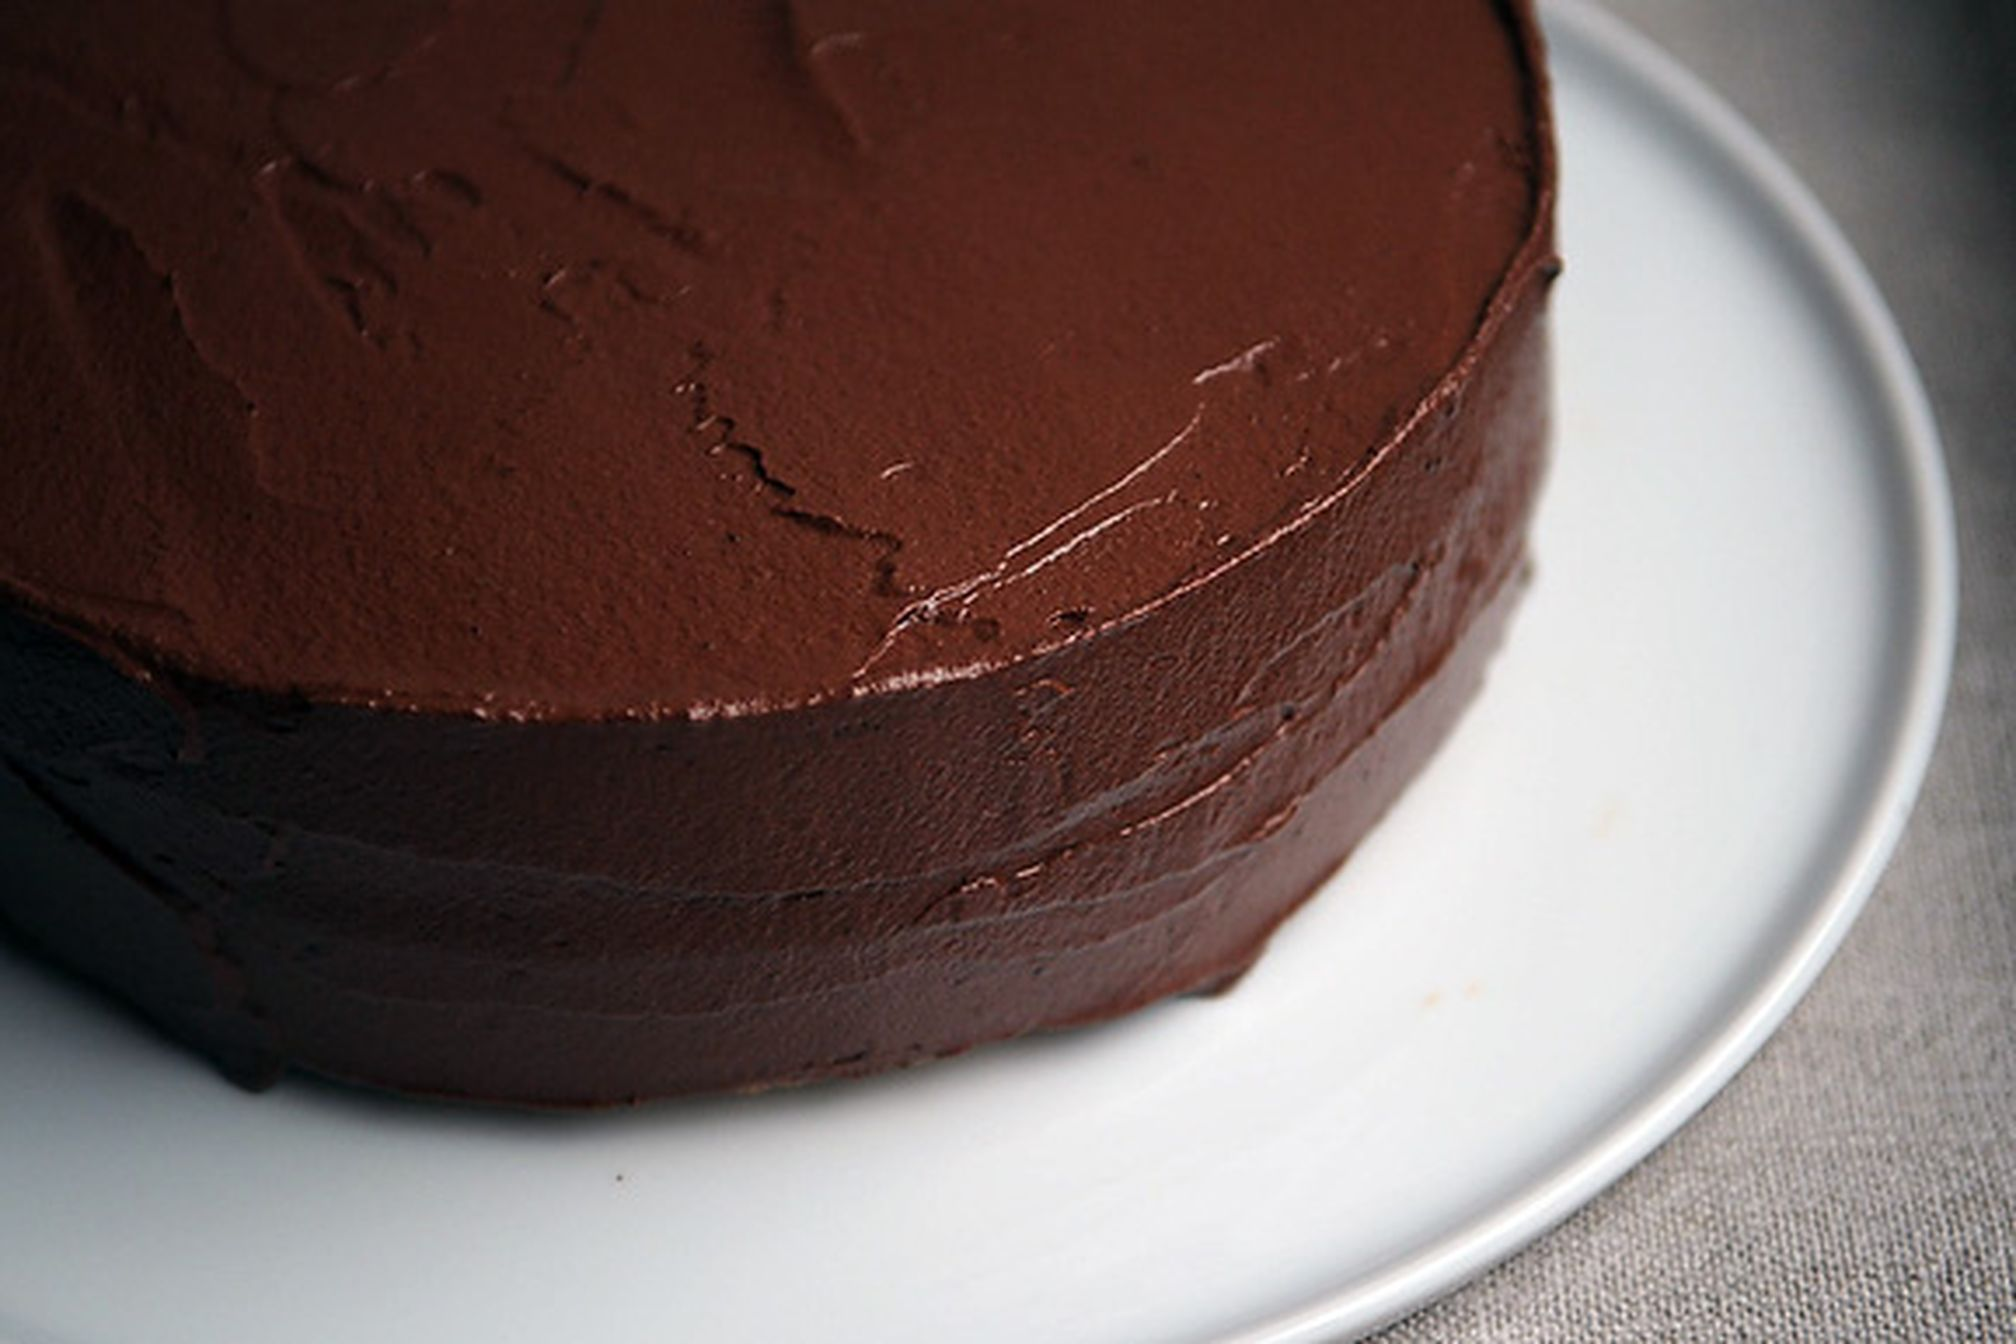 Wondrous Grown Up Birthday Cake Recipe On Food52 Funny Birthday Cards Online Benoljebrpdamsfinfo